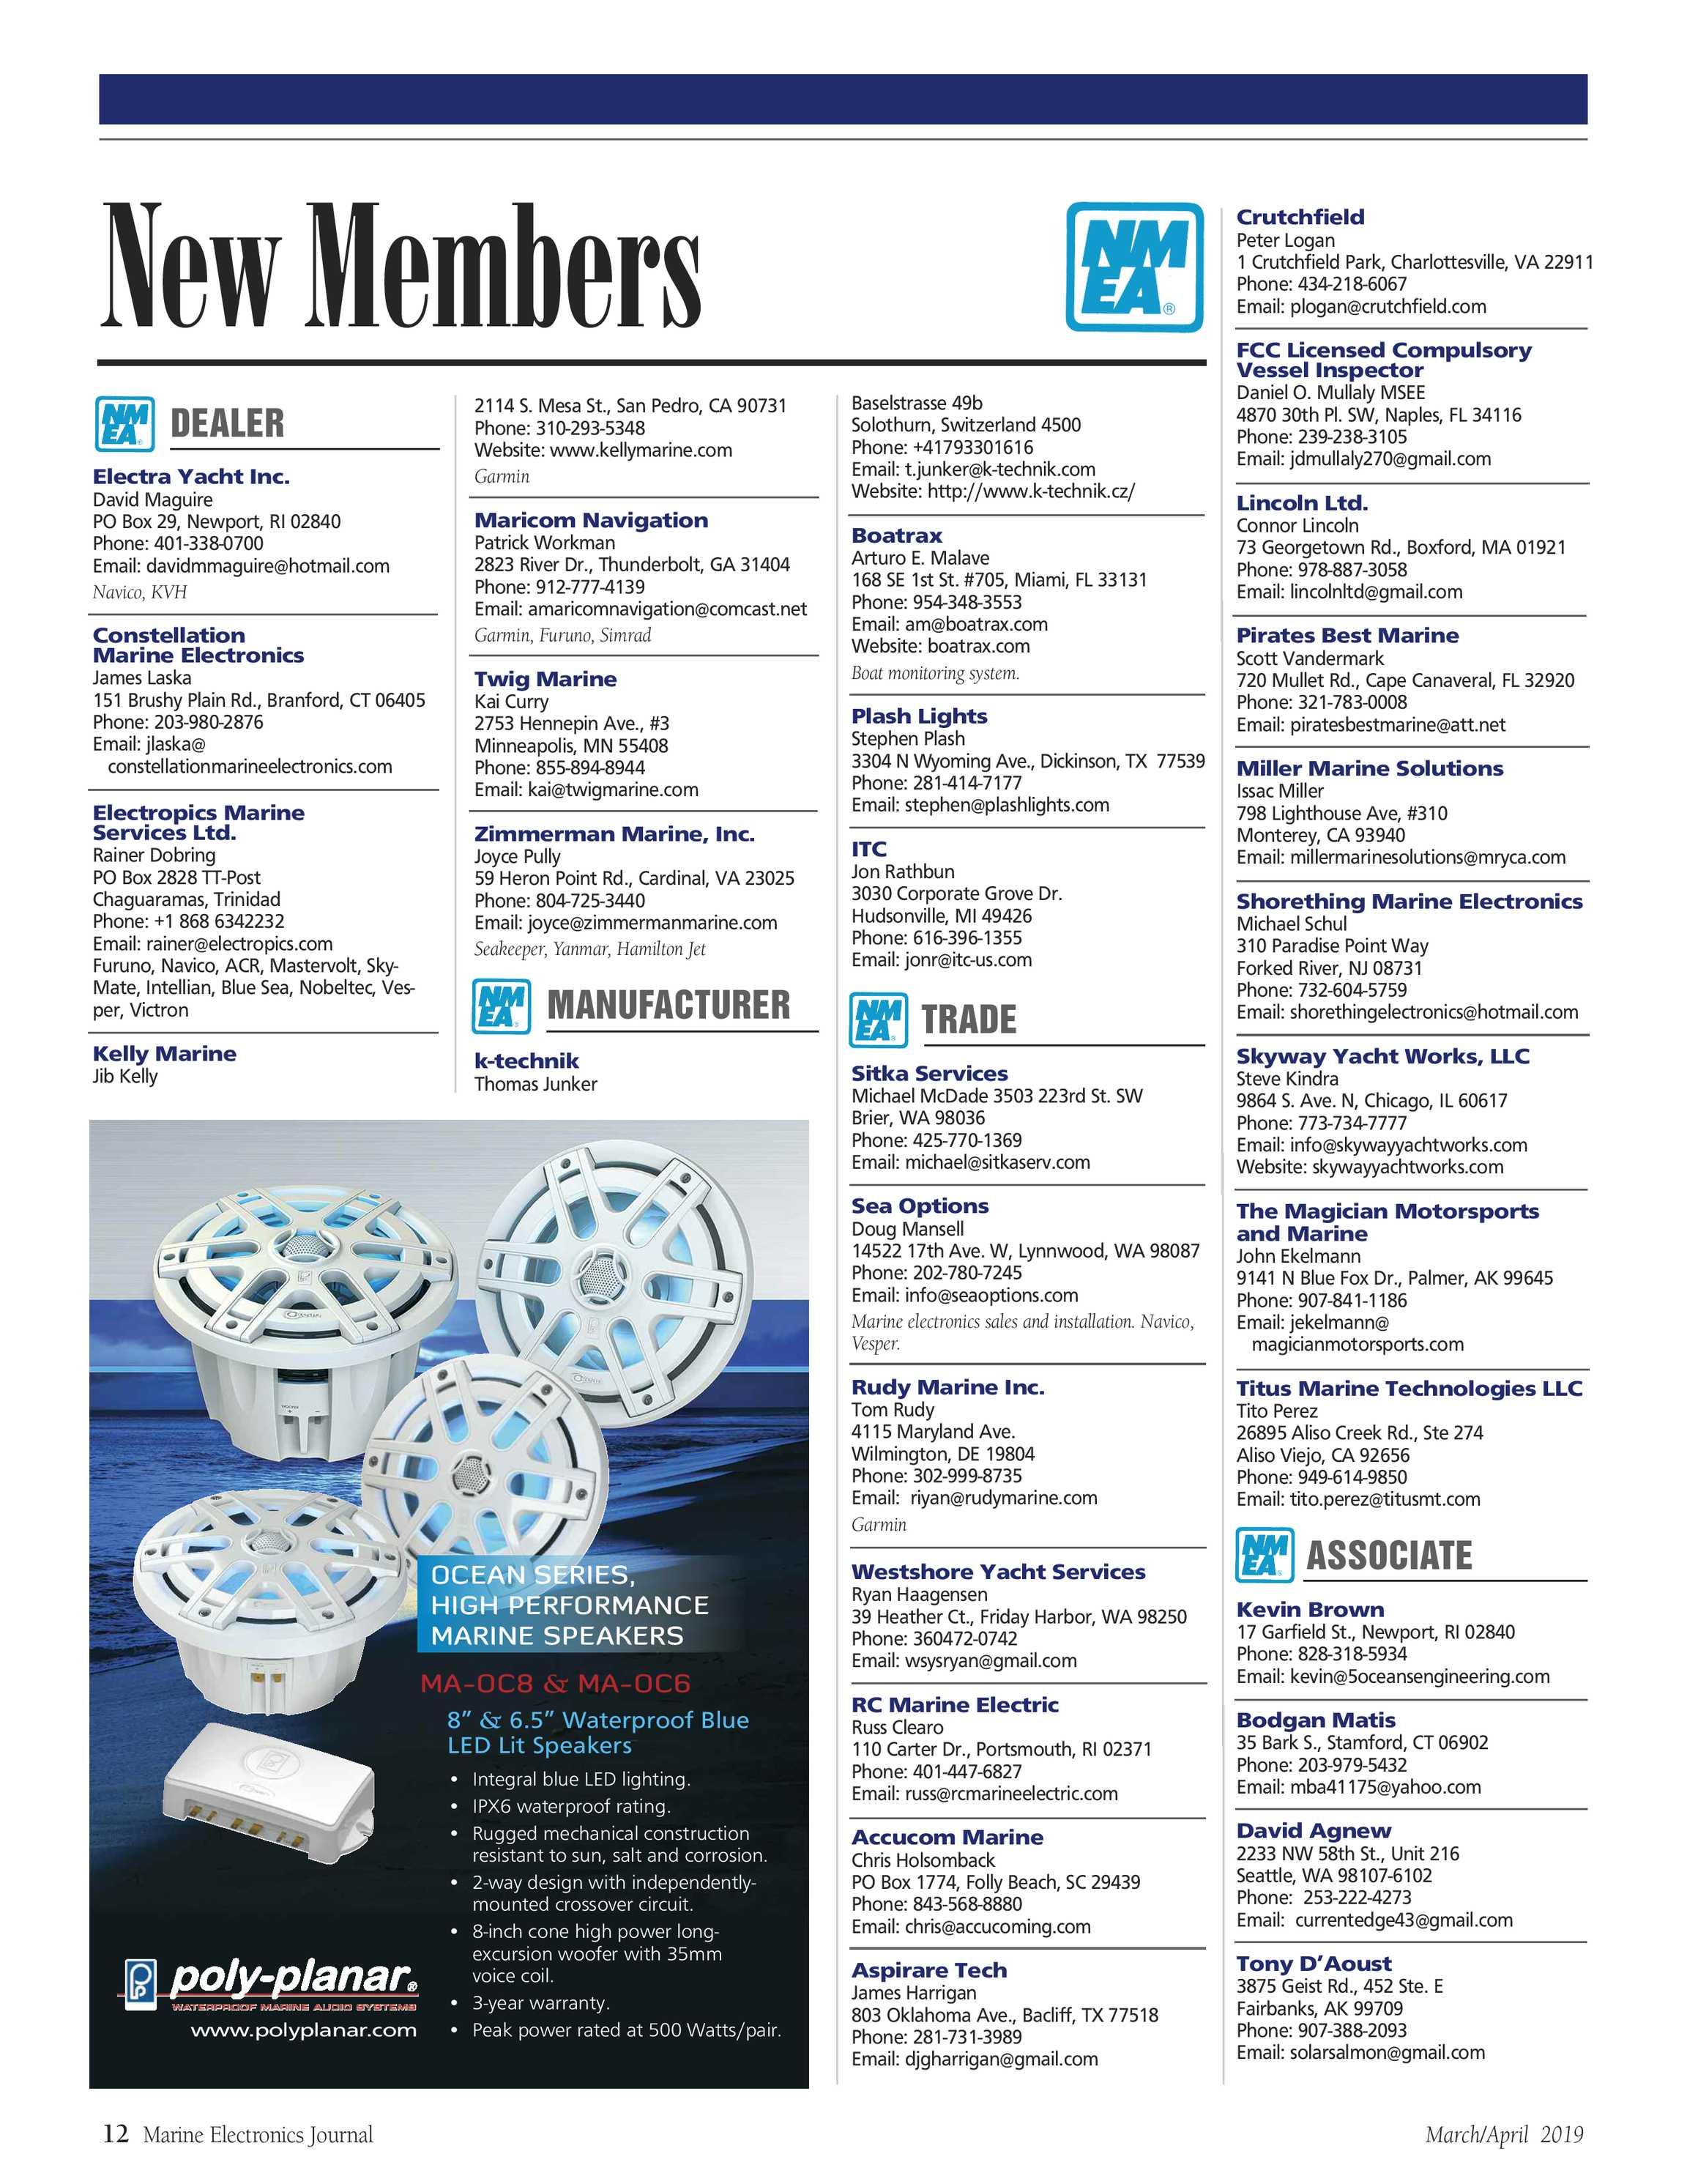 ME Marine Electronics - March/April 2019 - page 12